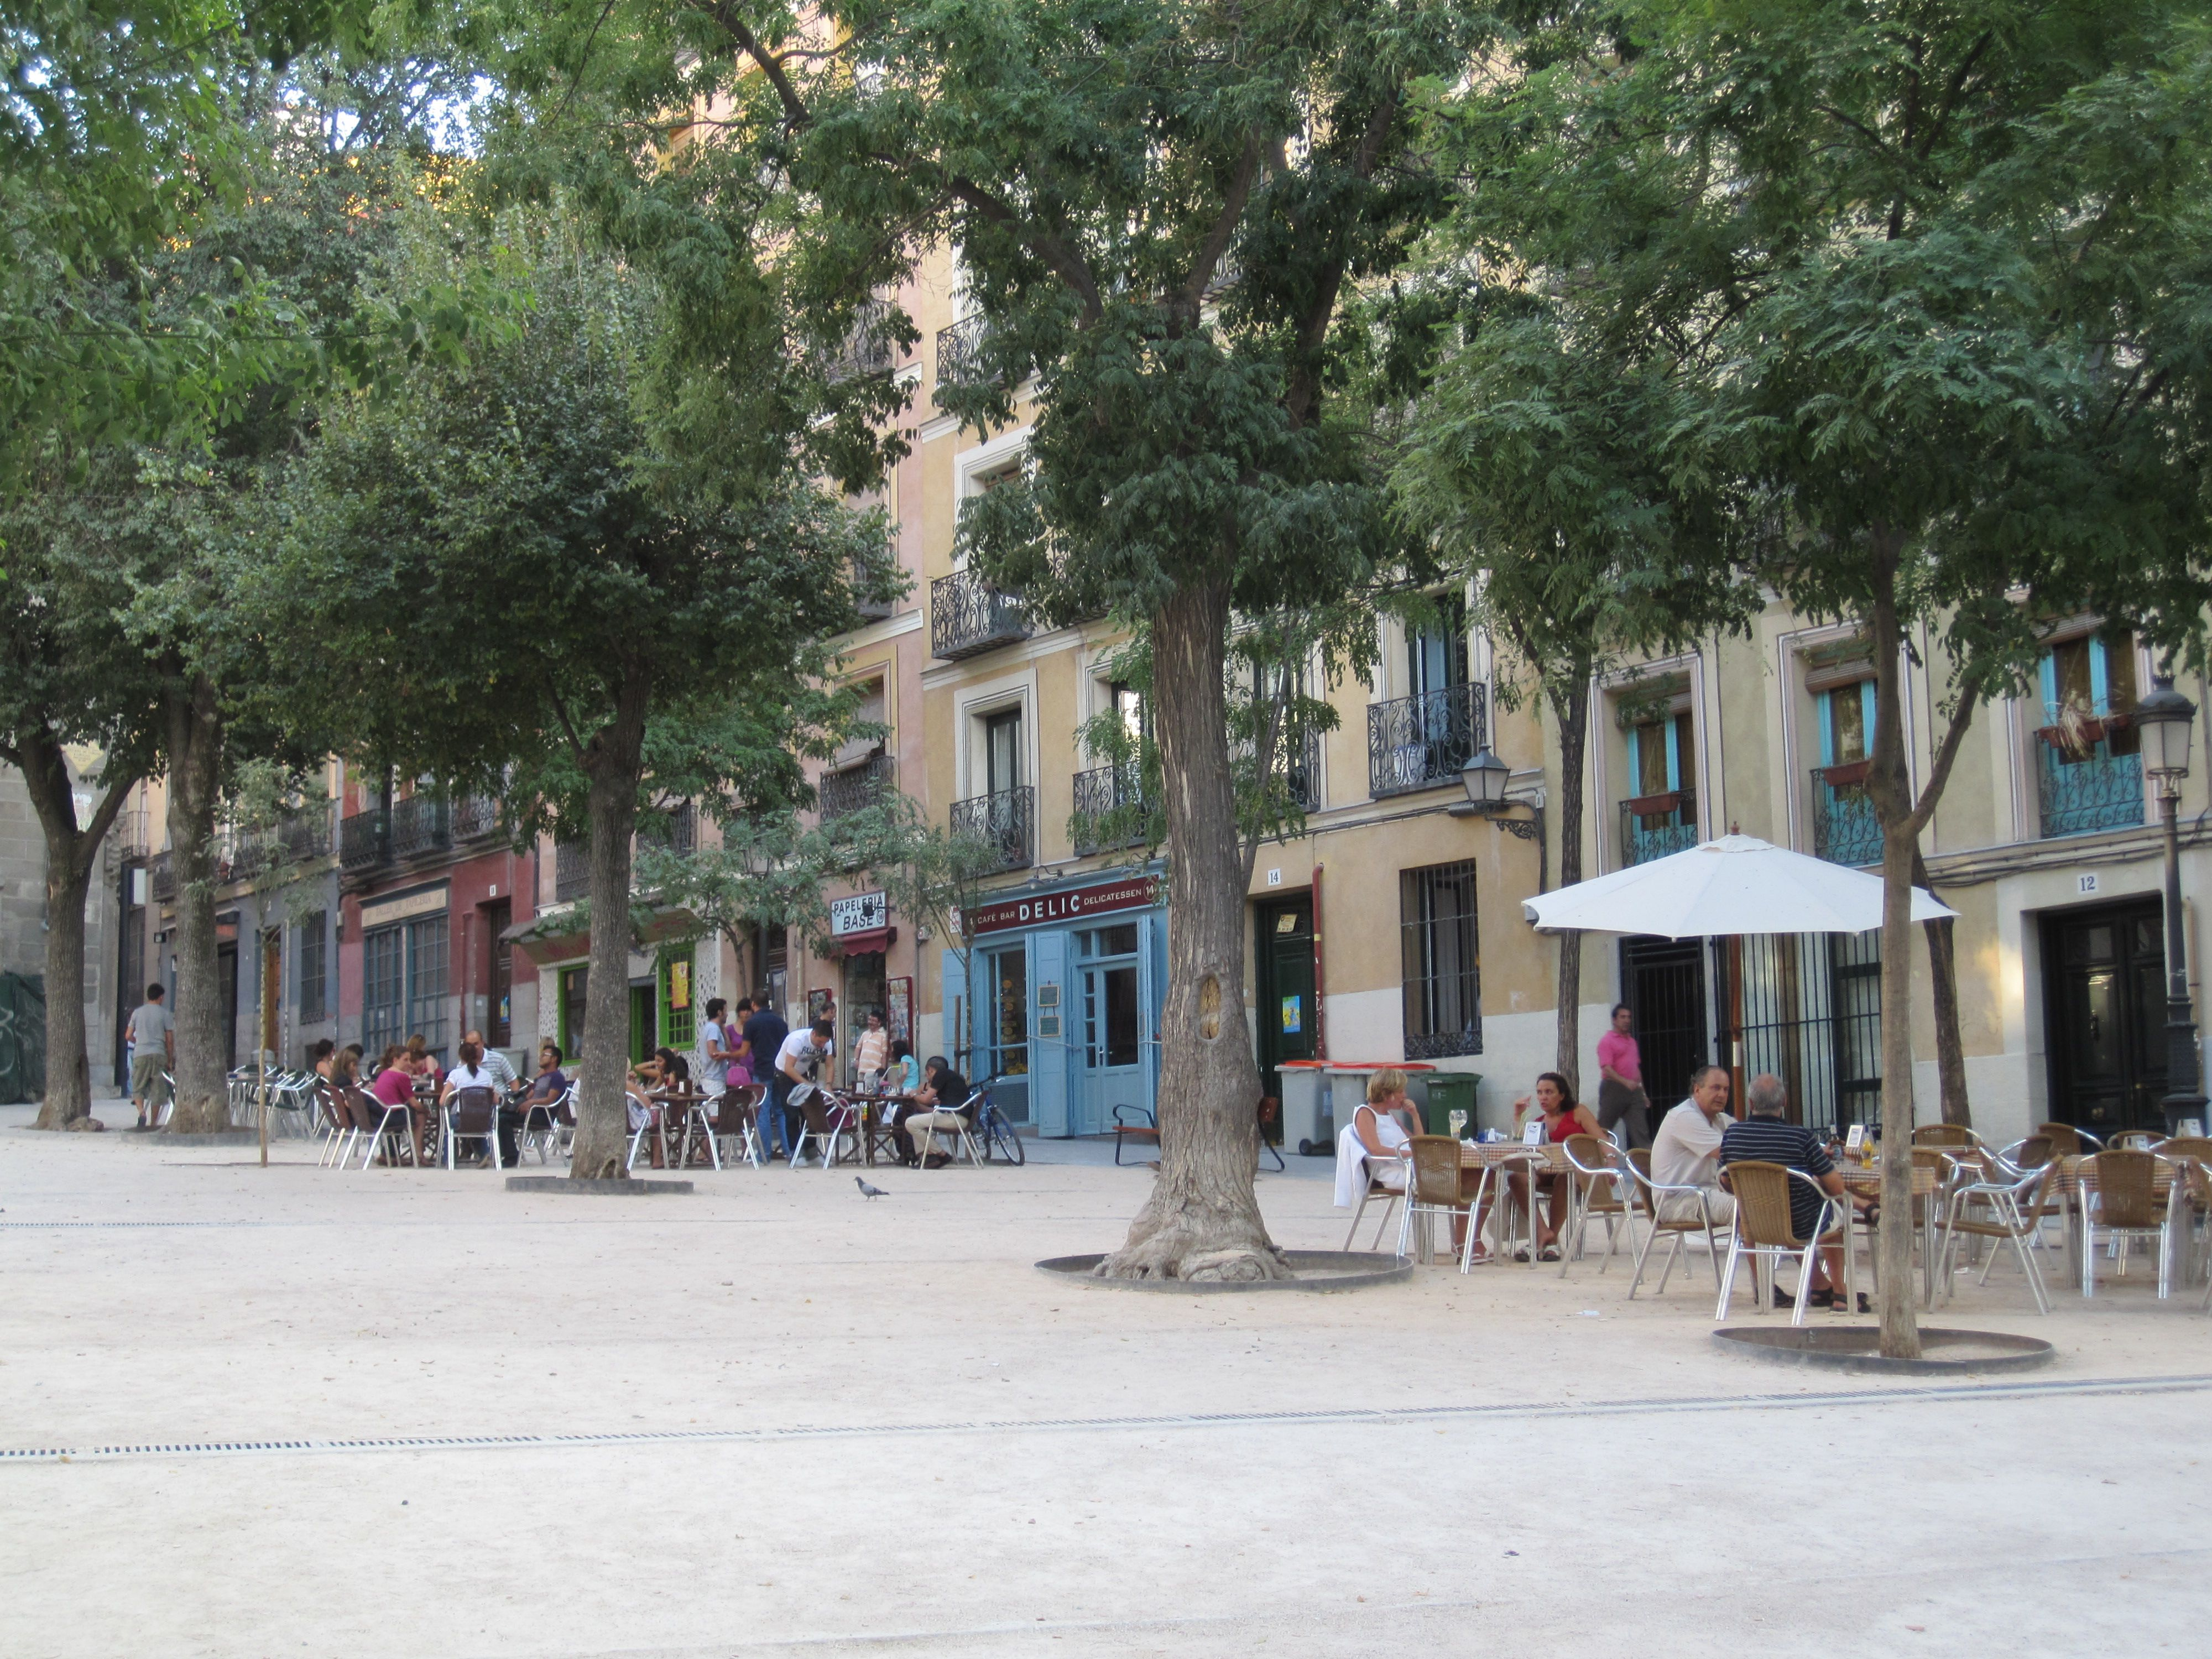 9 Things to Do in Madrid's La Latina Neighborhood